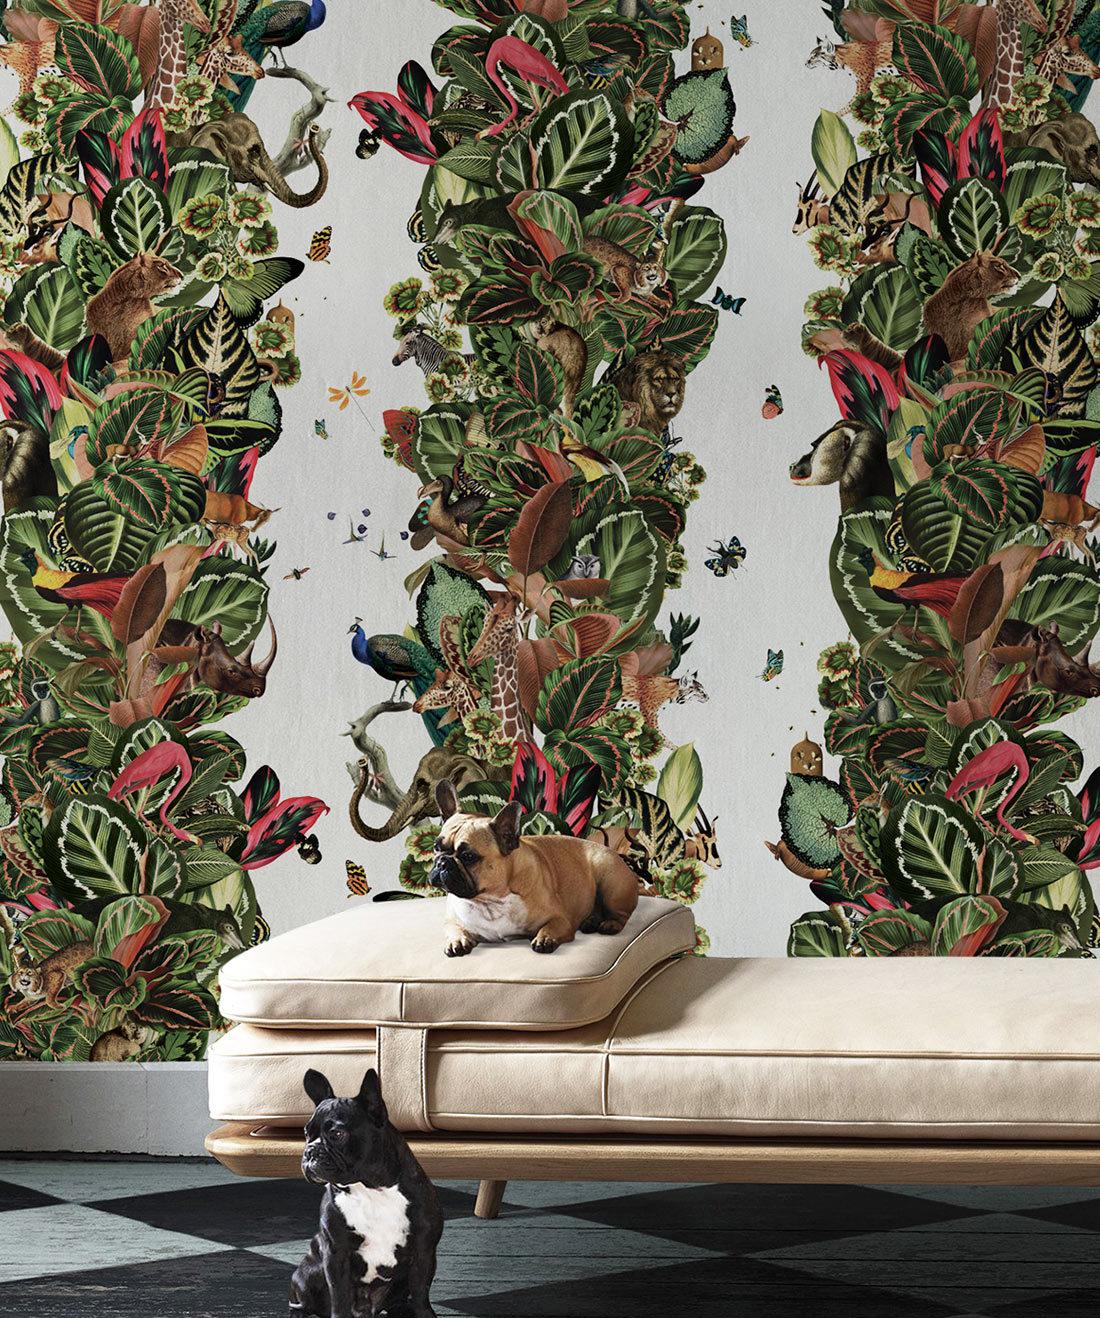 Viva Tropicana, Tropical Wallpaper Cream